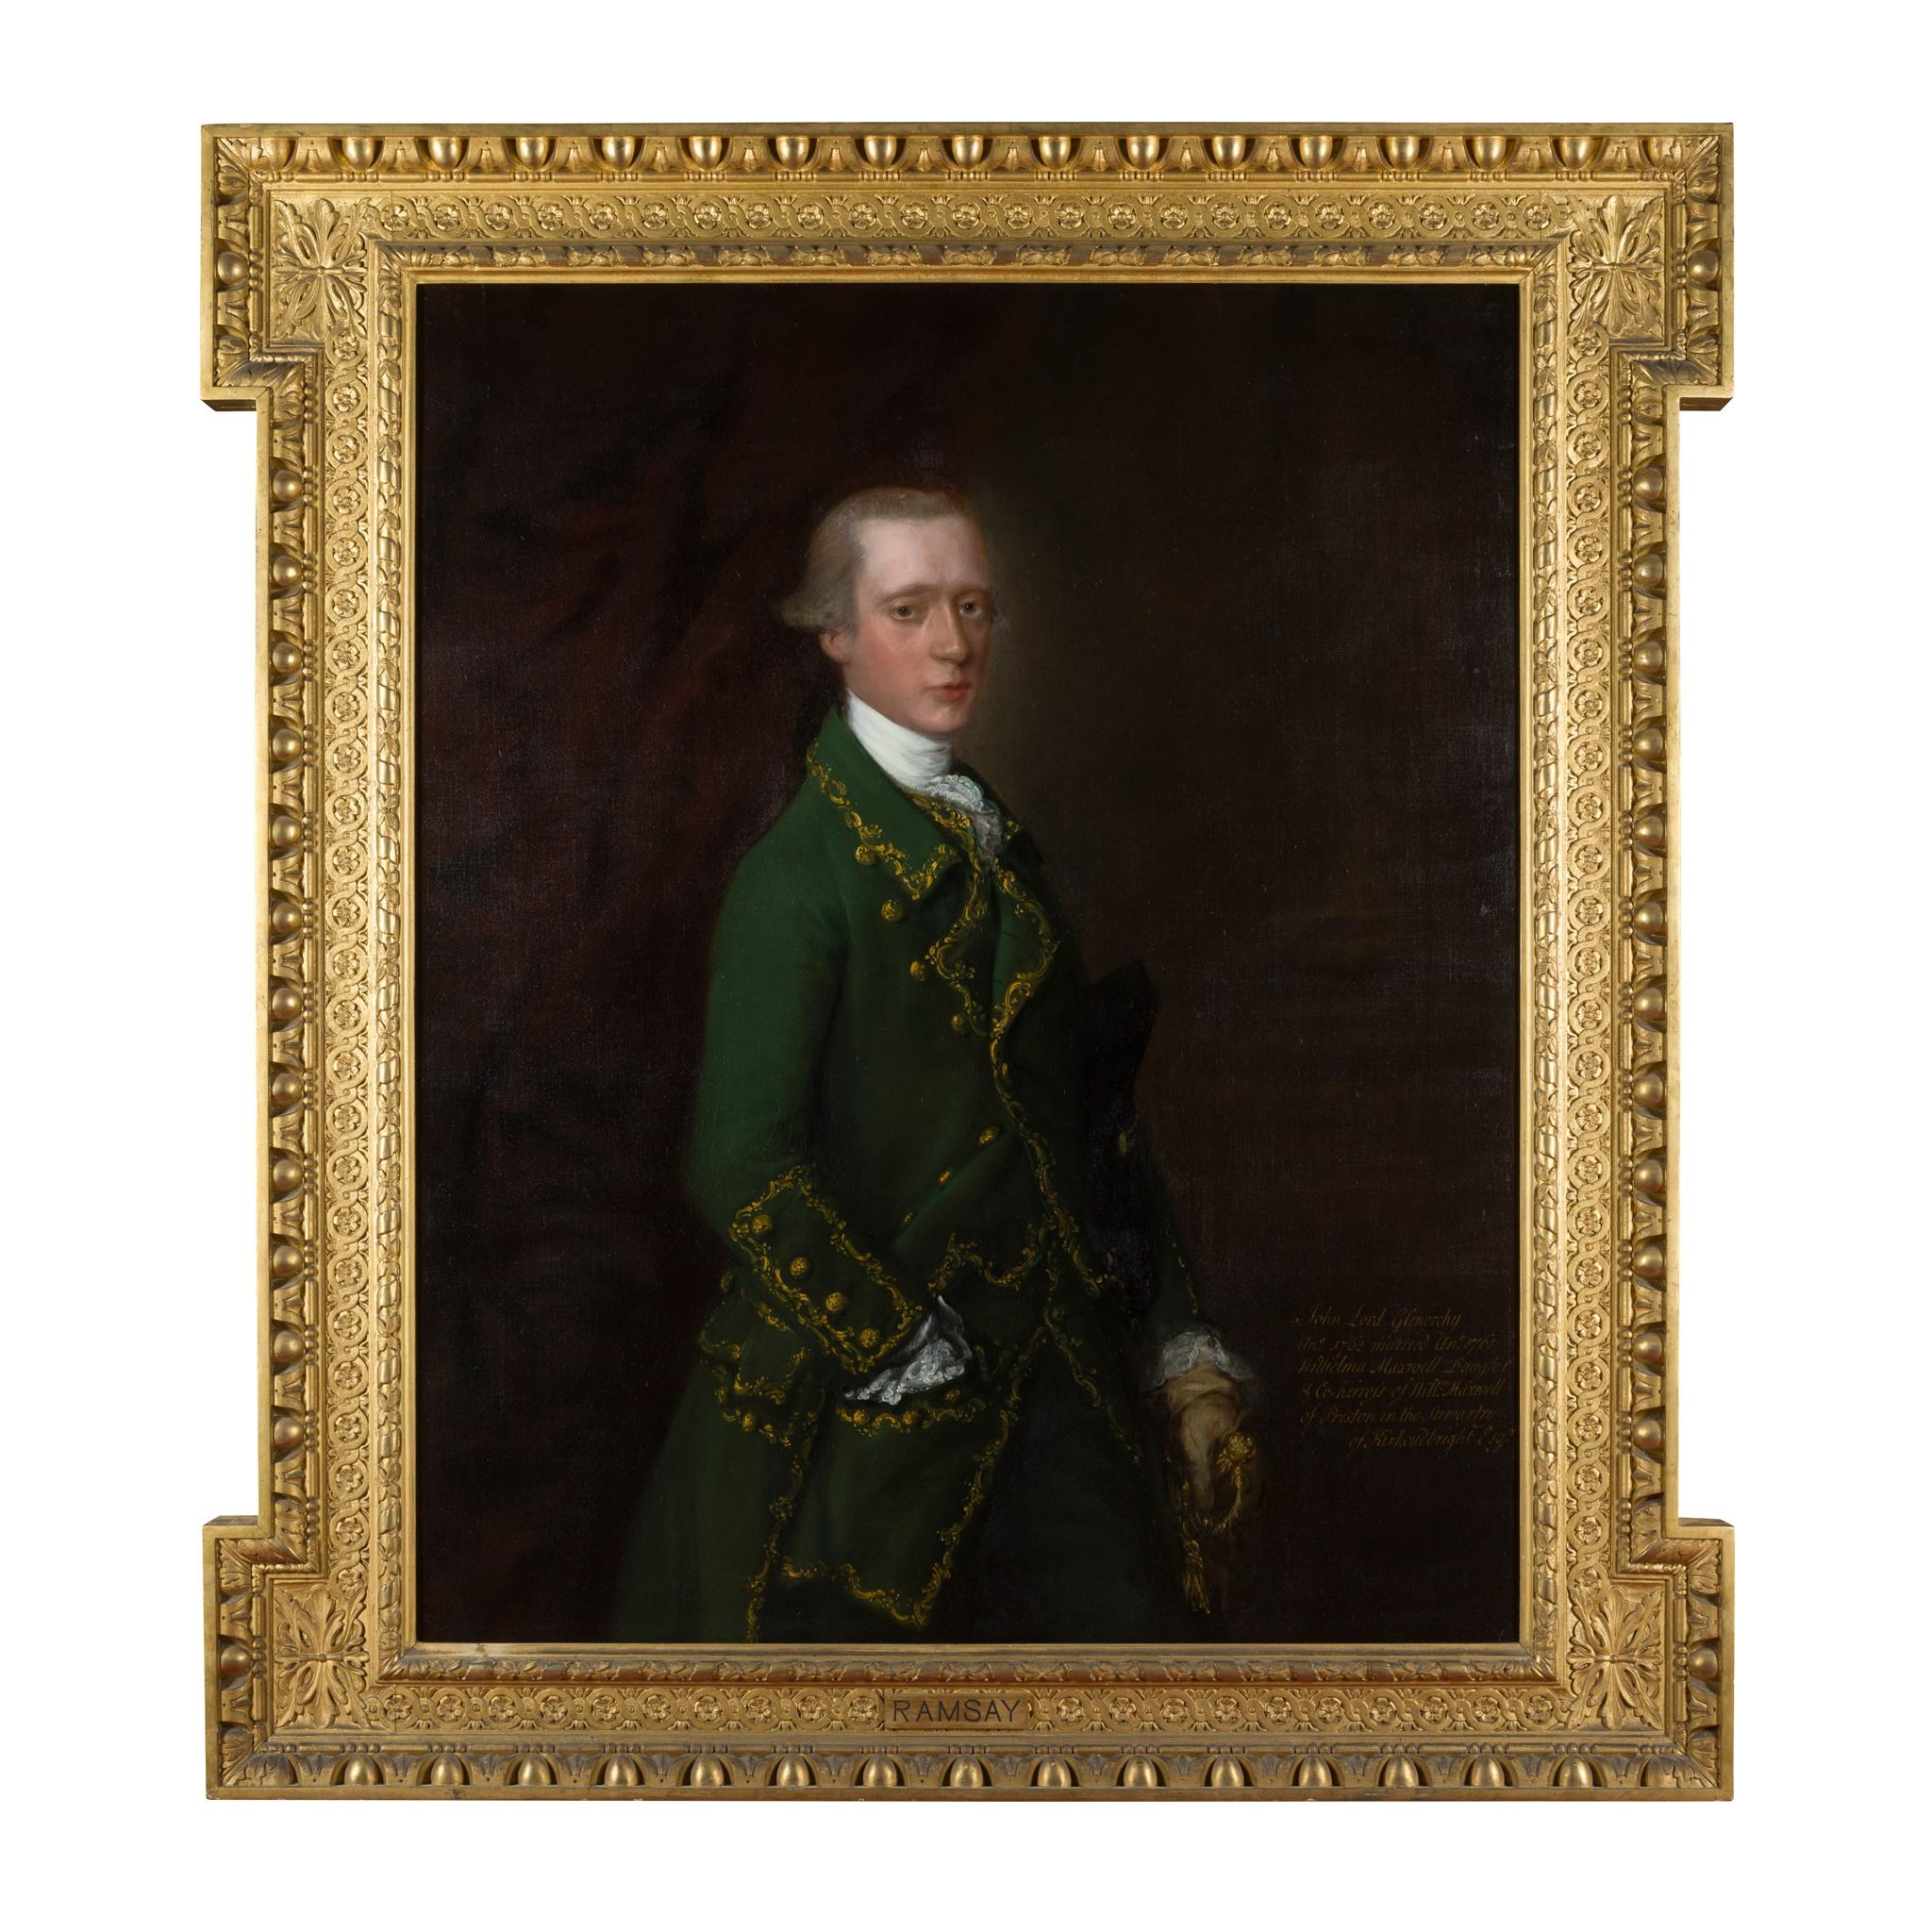 ◆ THOMAS GAINSBOROUGH R.A. (BRITISH 1717-1788) HALF-LENGTH PORTRAIT OF JOHN CAMPBELL, VISCOUNT - Image 2 of 2